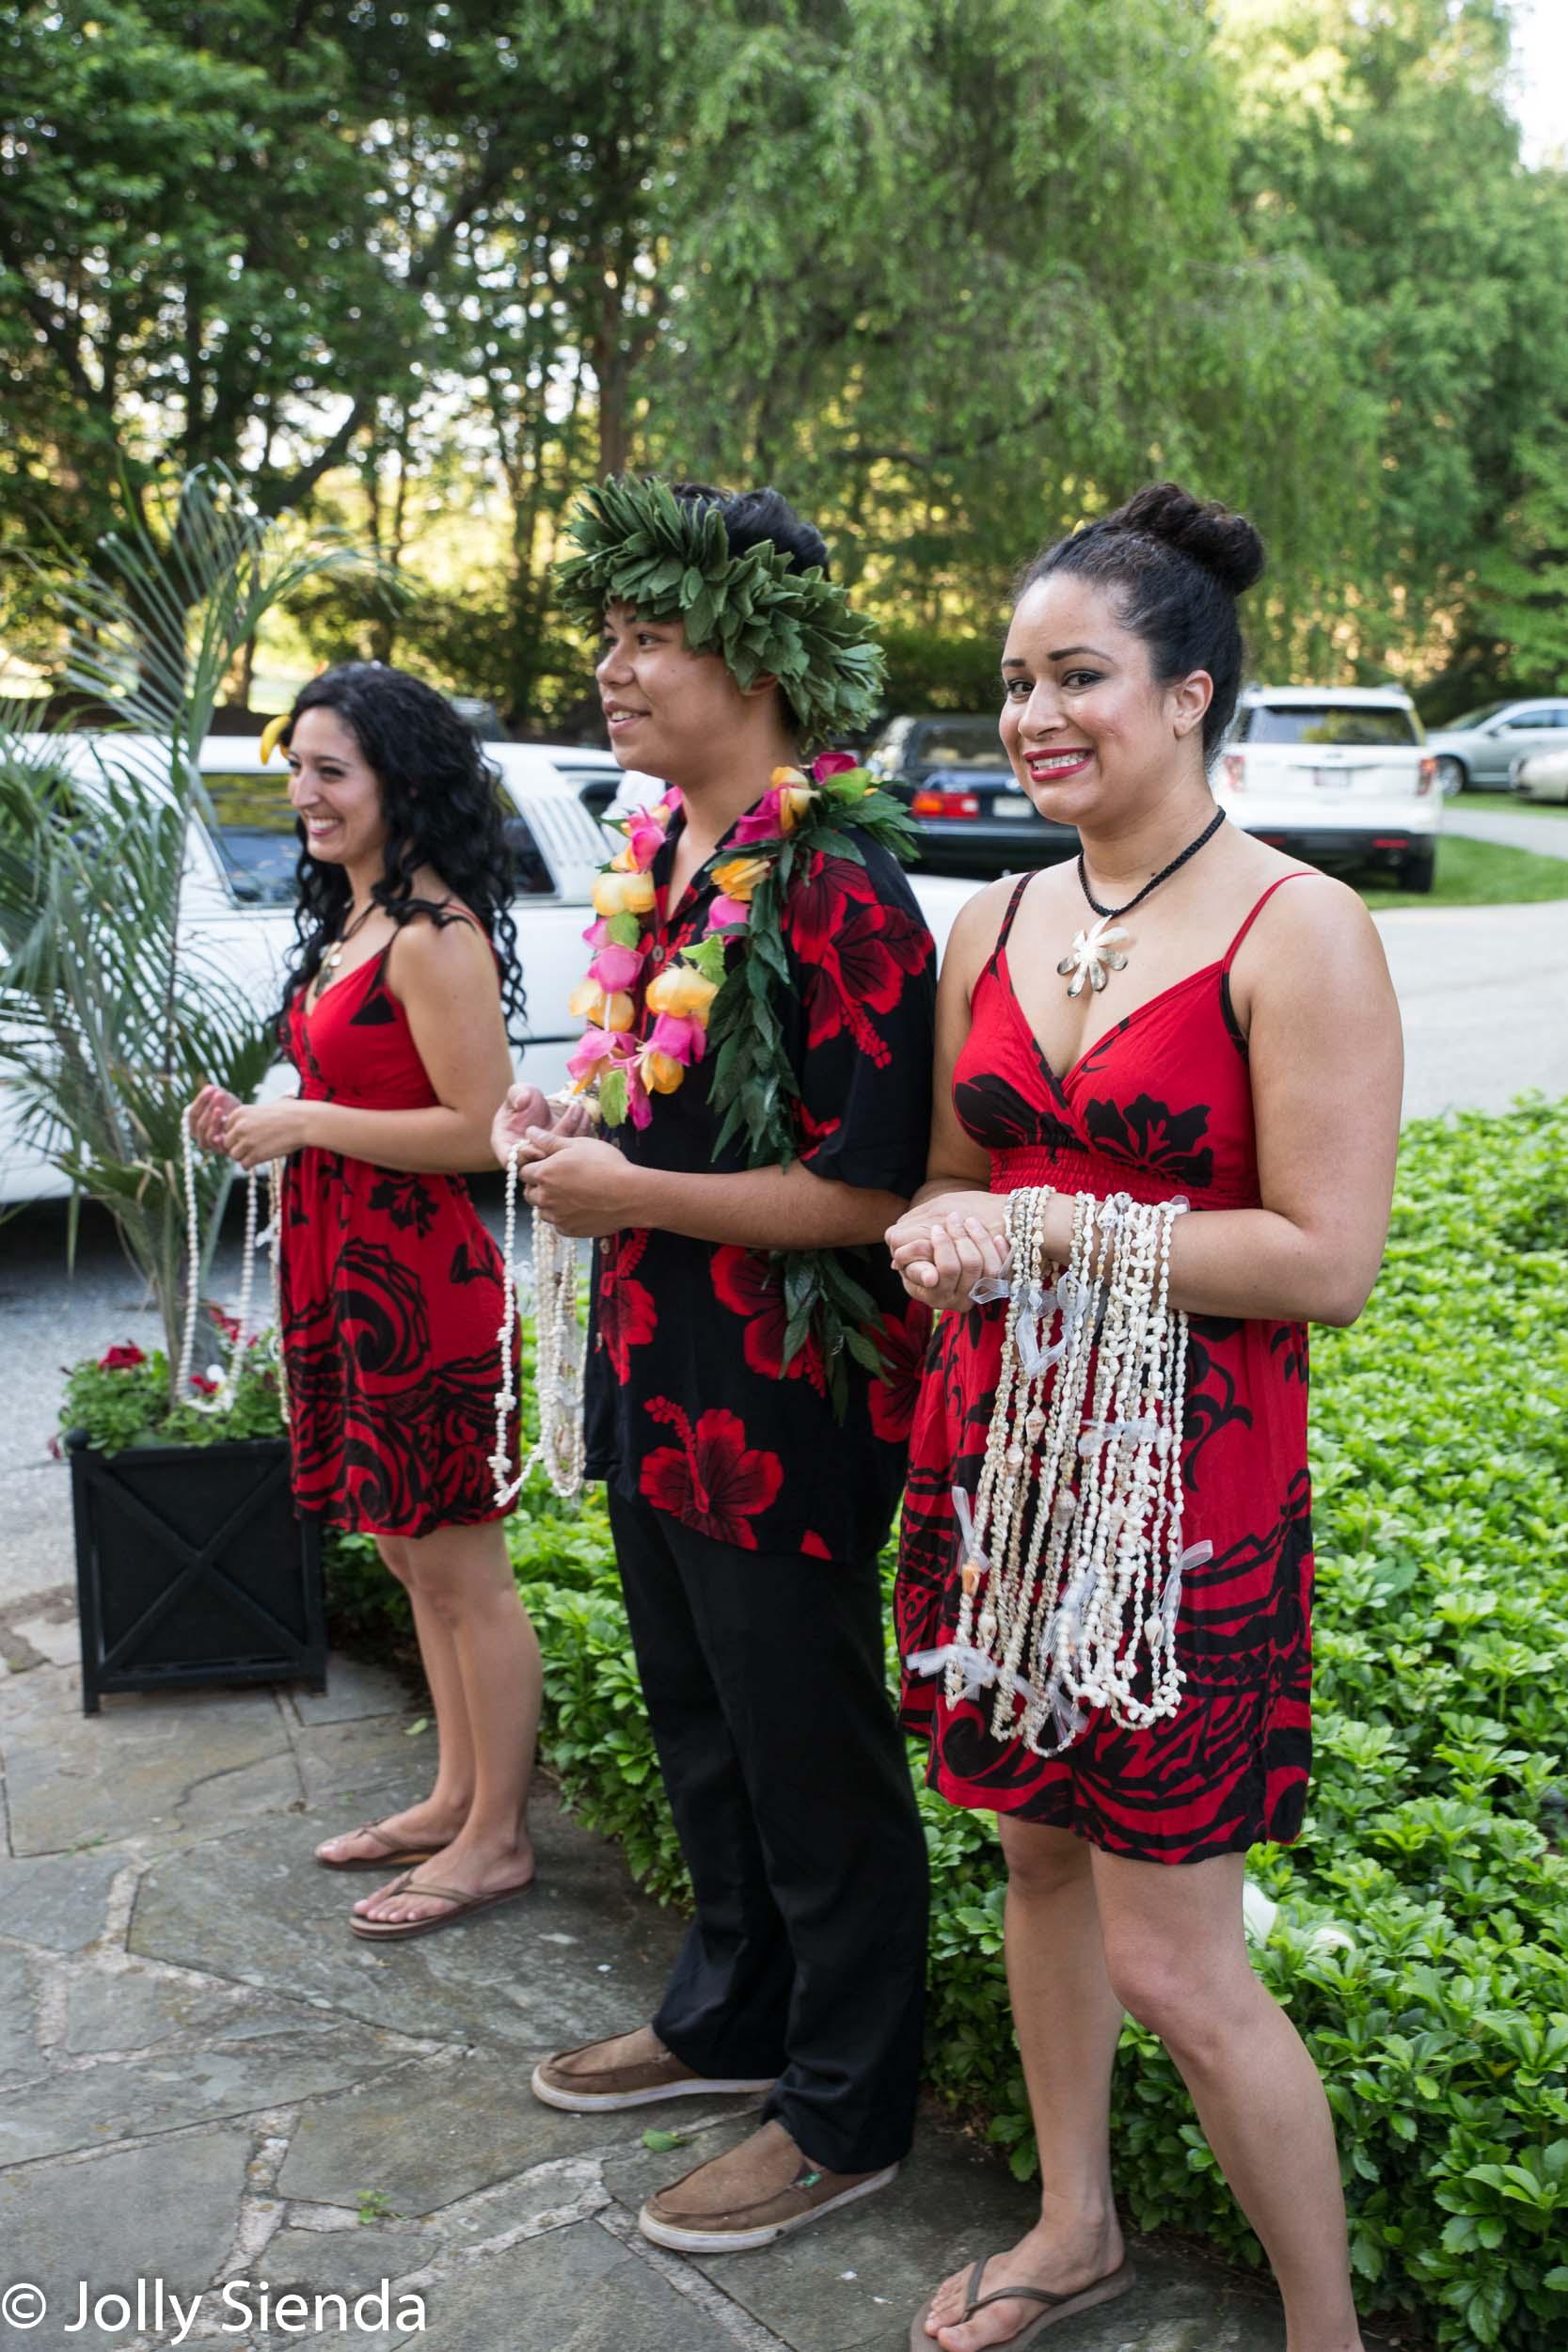 Luau wedding with flower leis